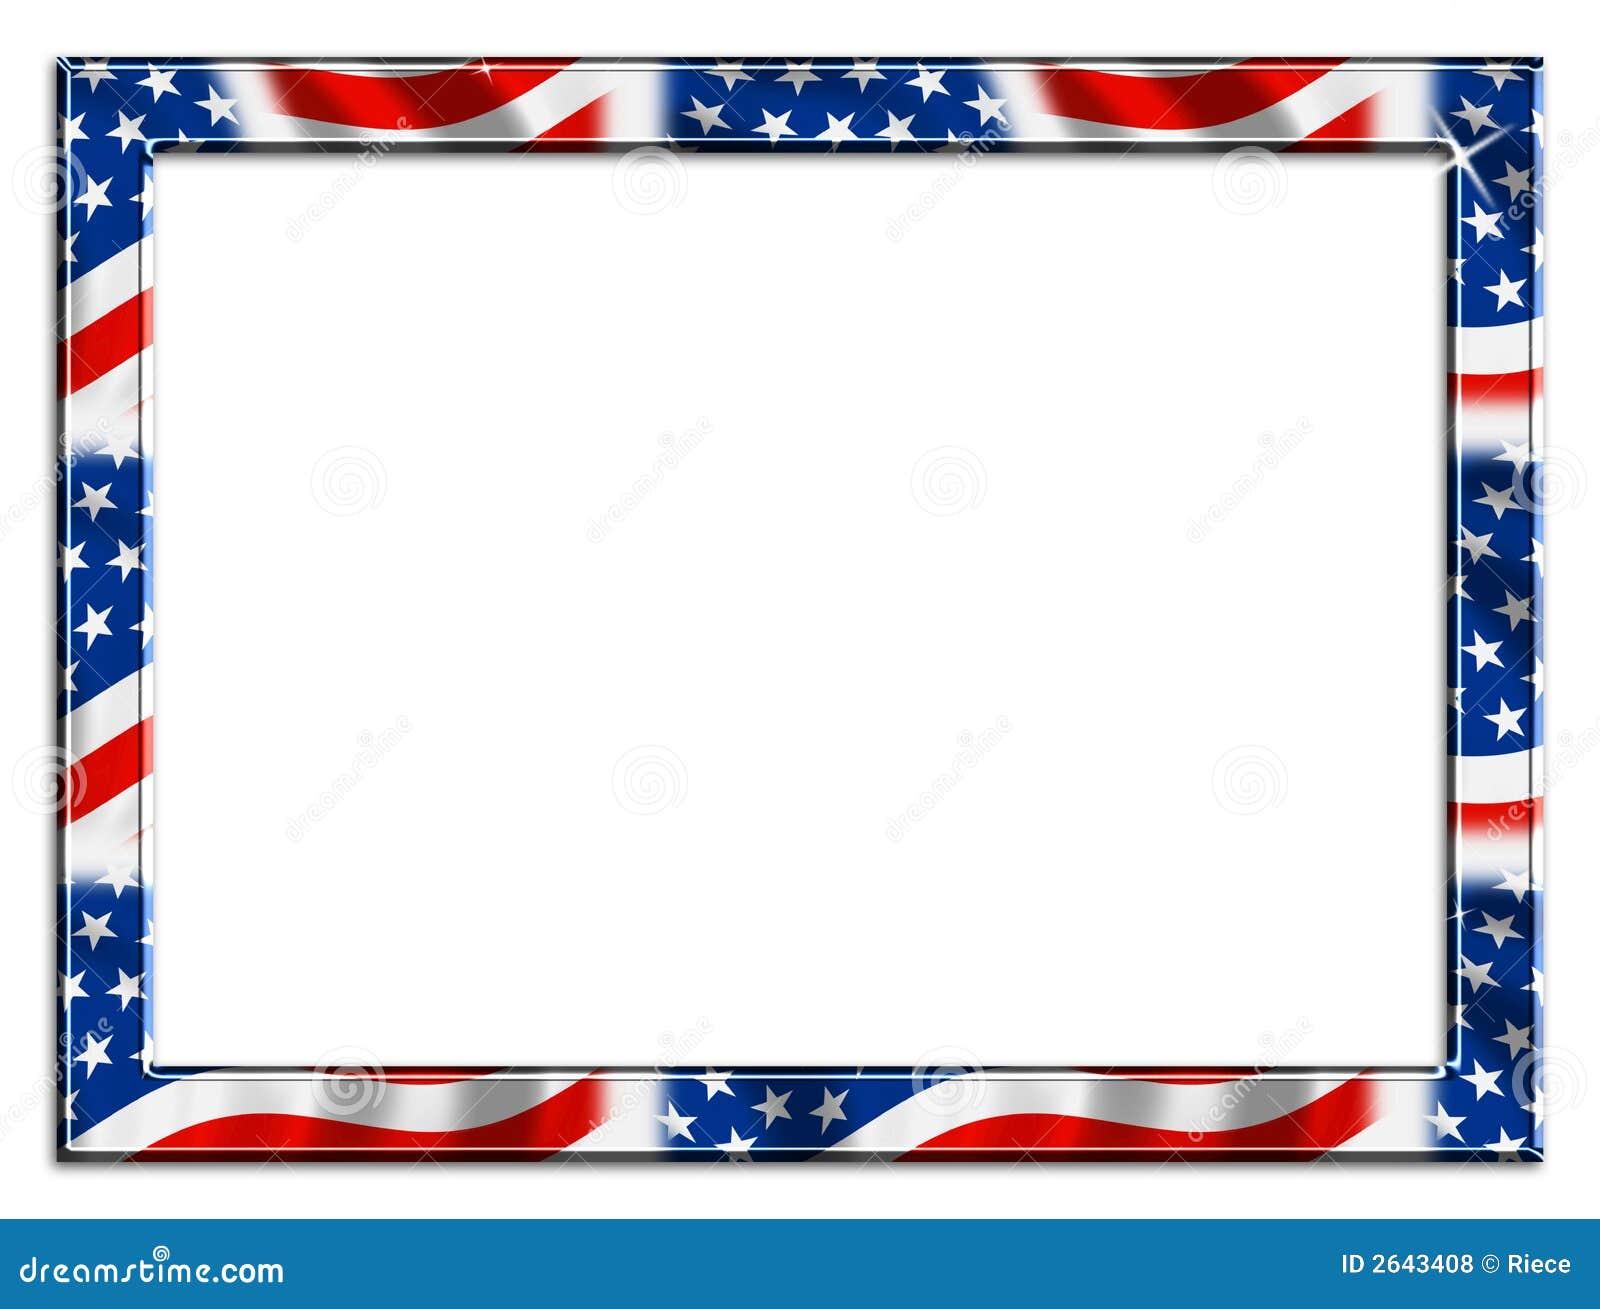 Patriotic red white and blue border beveled frame on white background.